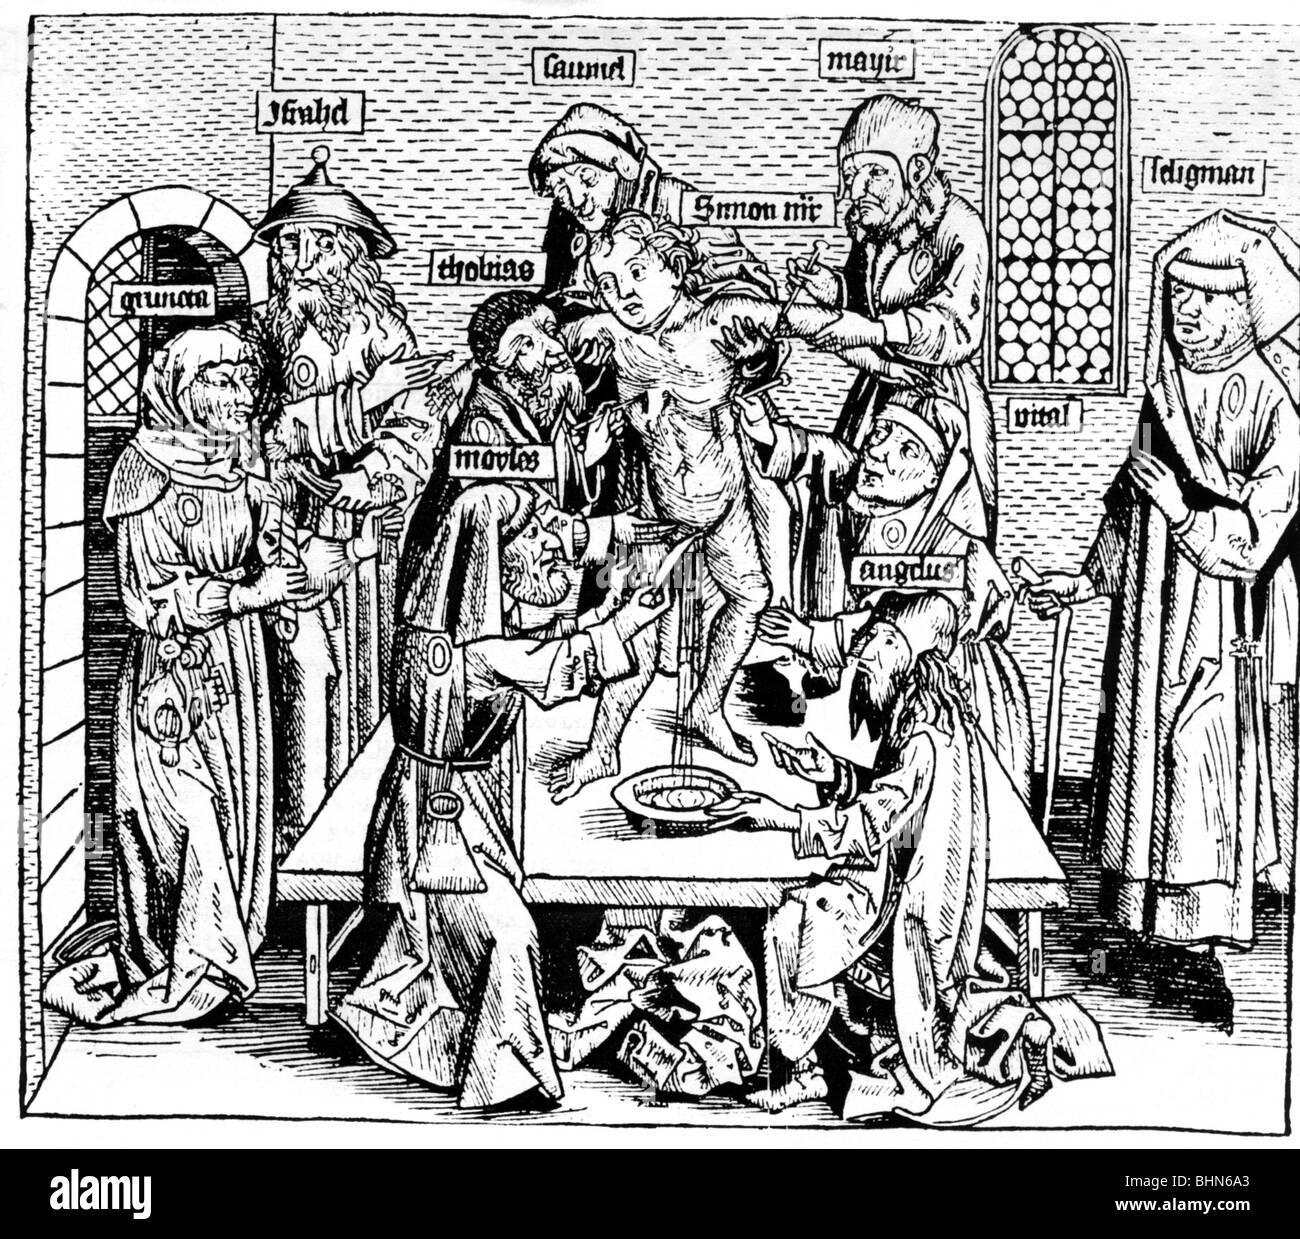 Judaism, persecution of the Jews, anti Jewish propaganda, alleged ritual murder, victim: Simon of Trent, 1475, woodcut - Stock Image